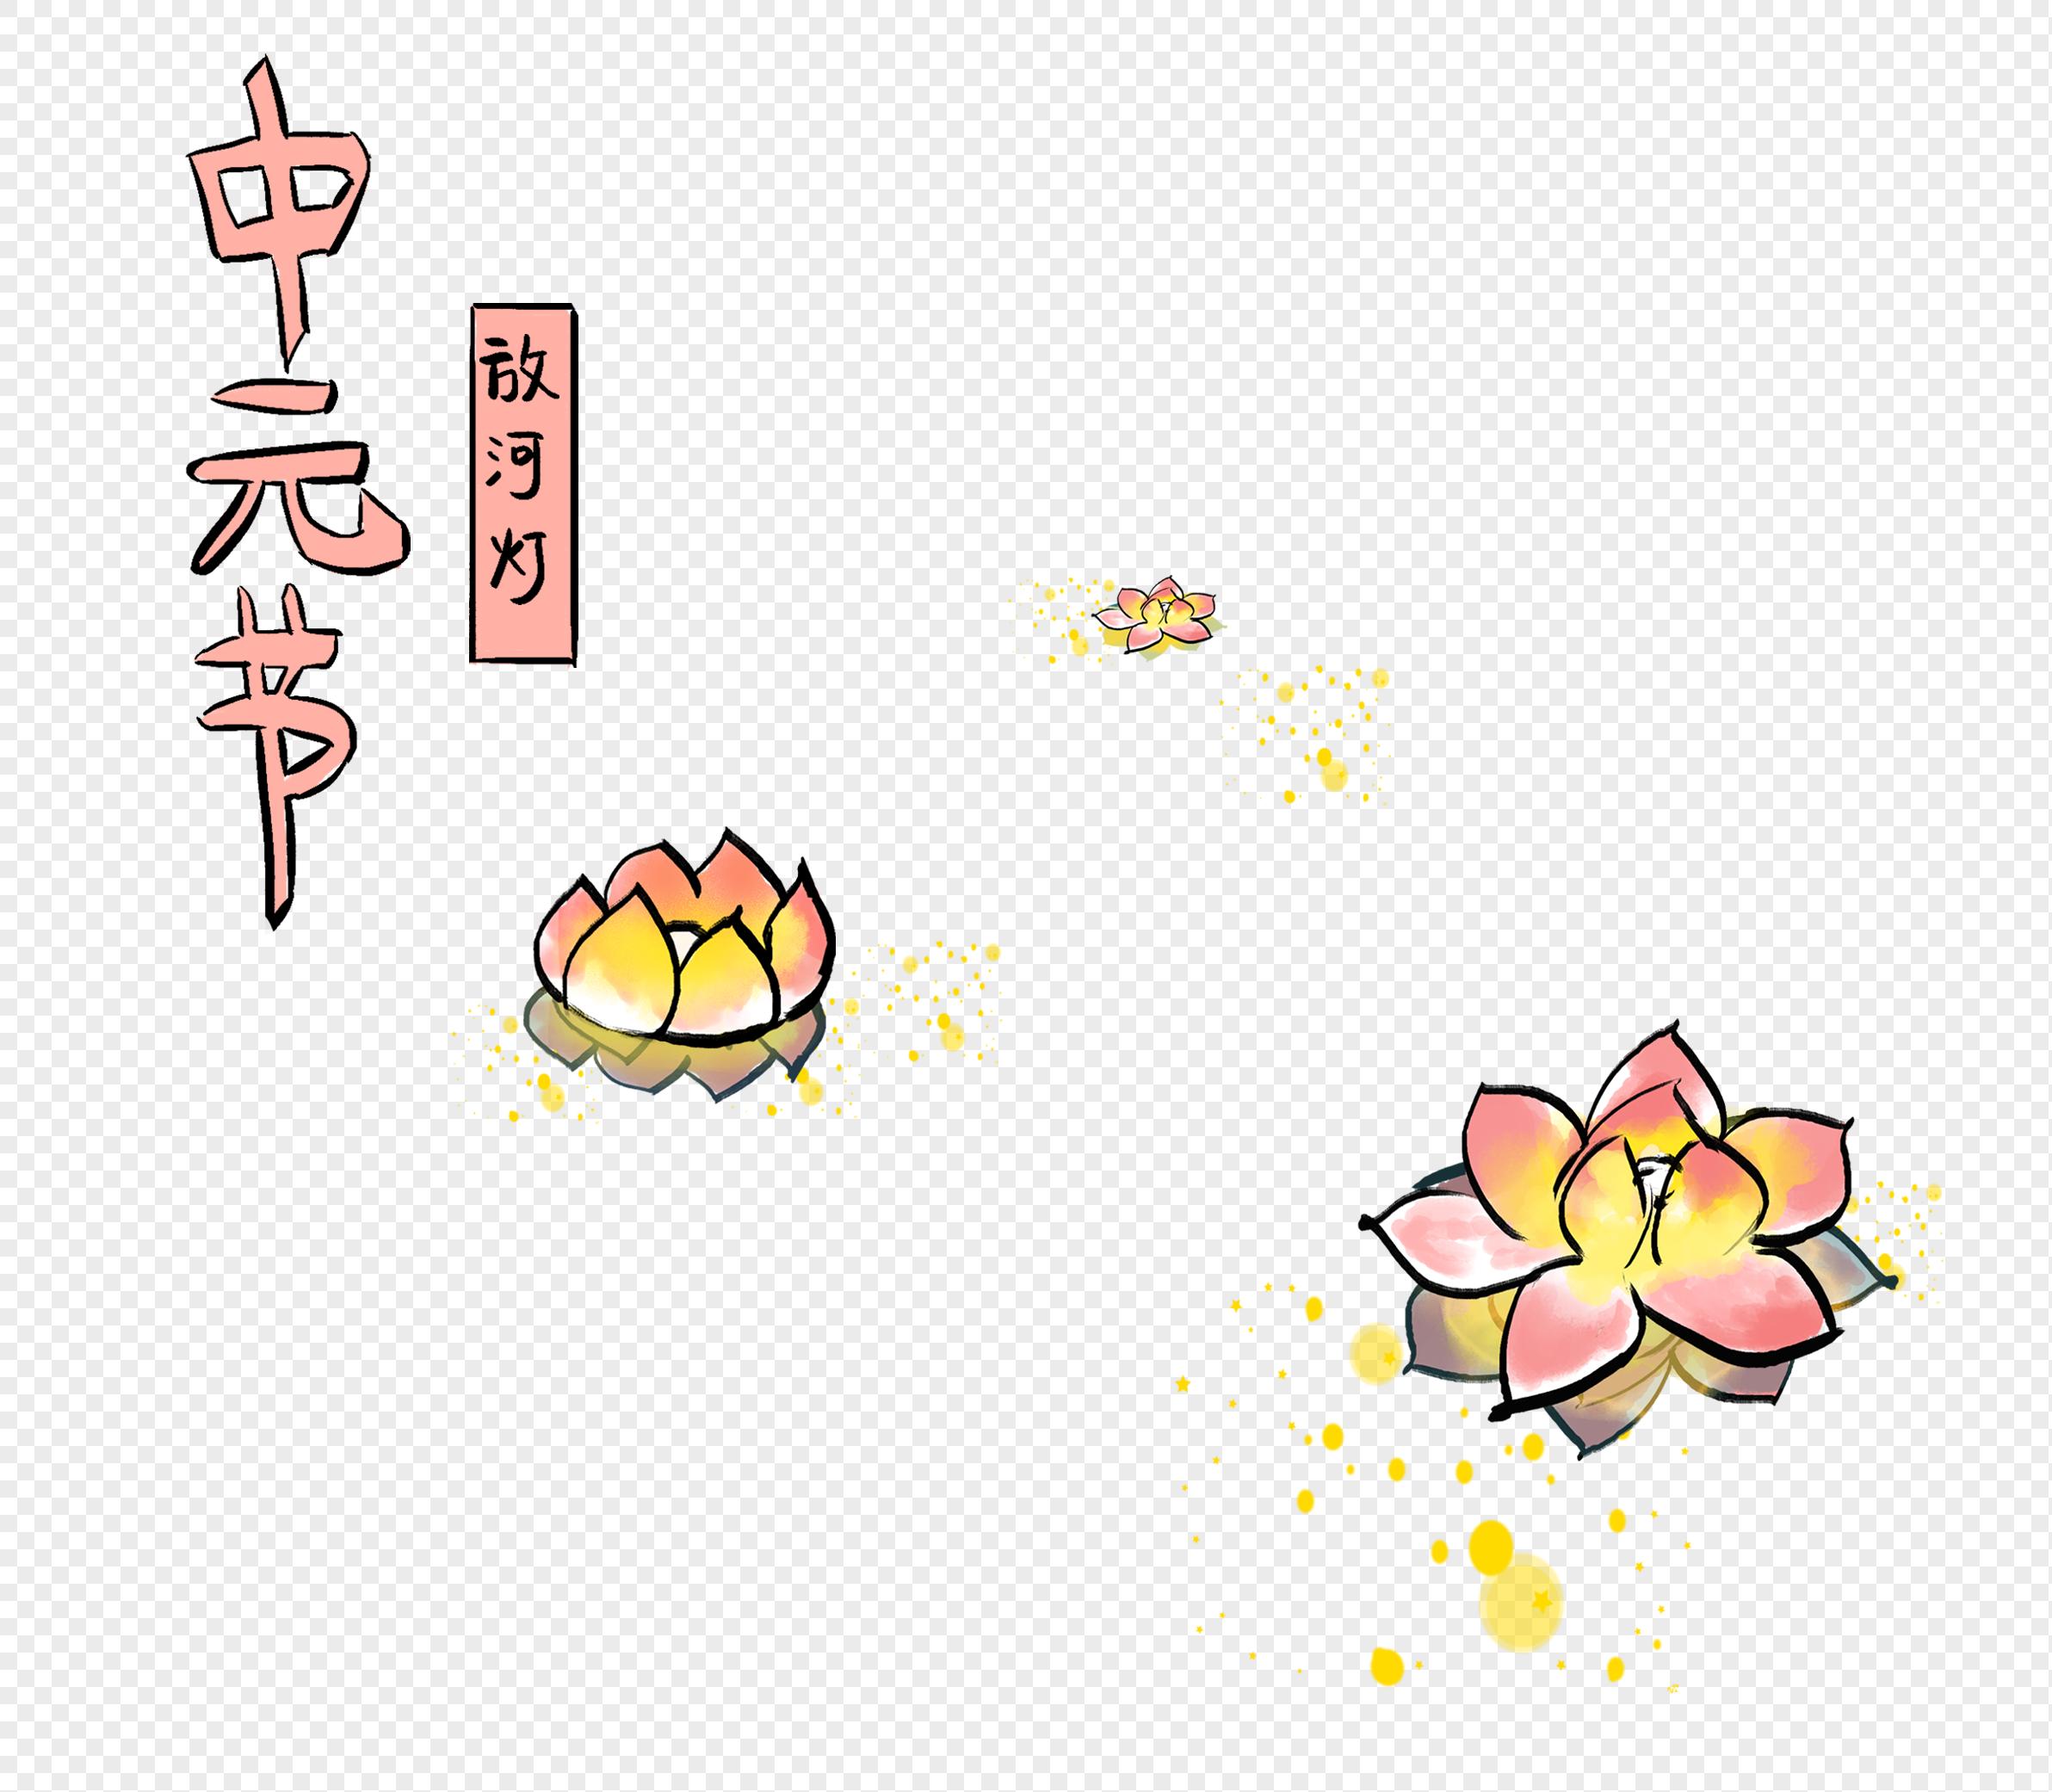 Lantern shaped like a lotus flower png imagepicture free download lantern shaped like a lotus flower izmirmasajfo